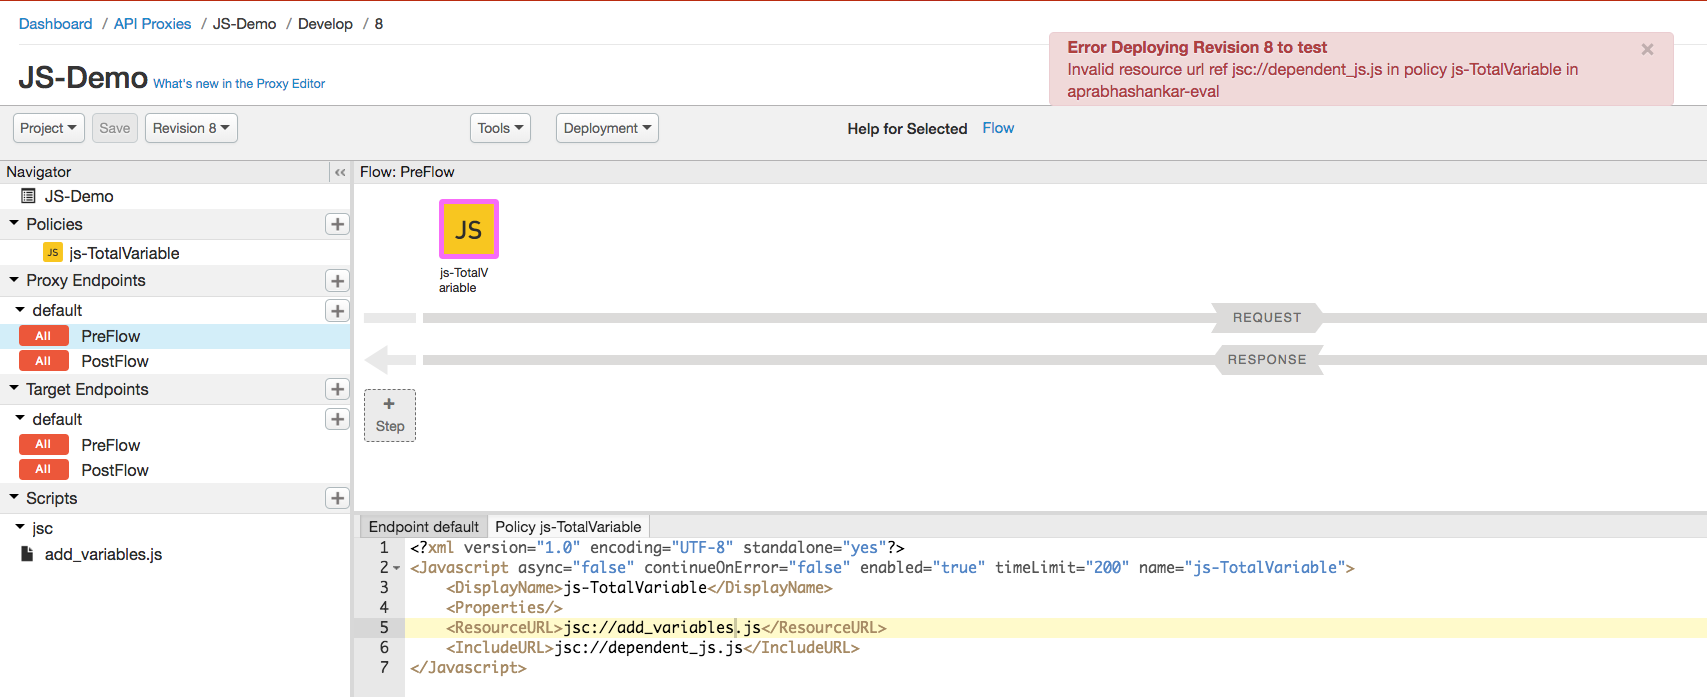 Erreur d'URL de ressource non valide